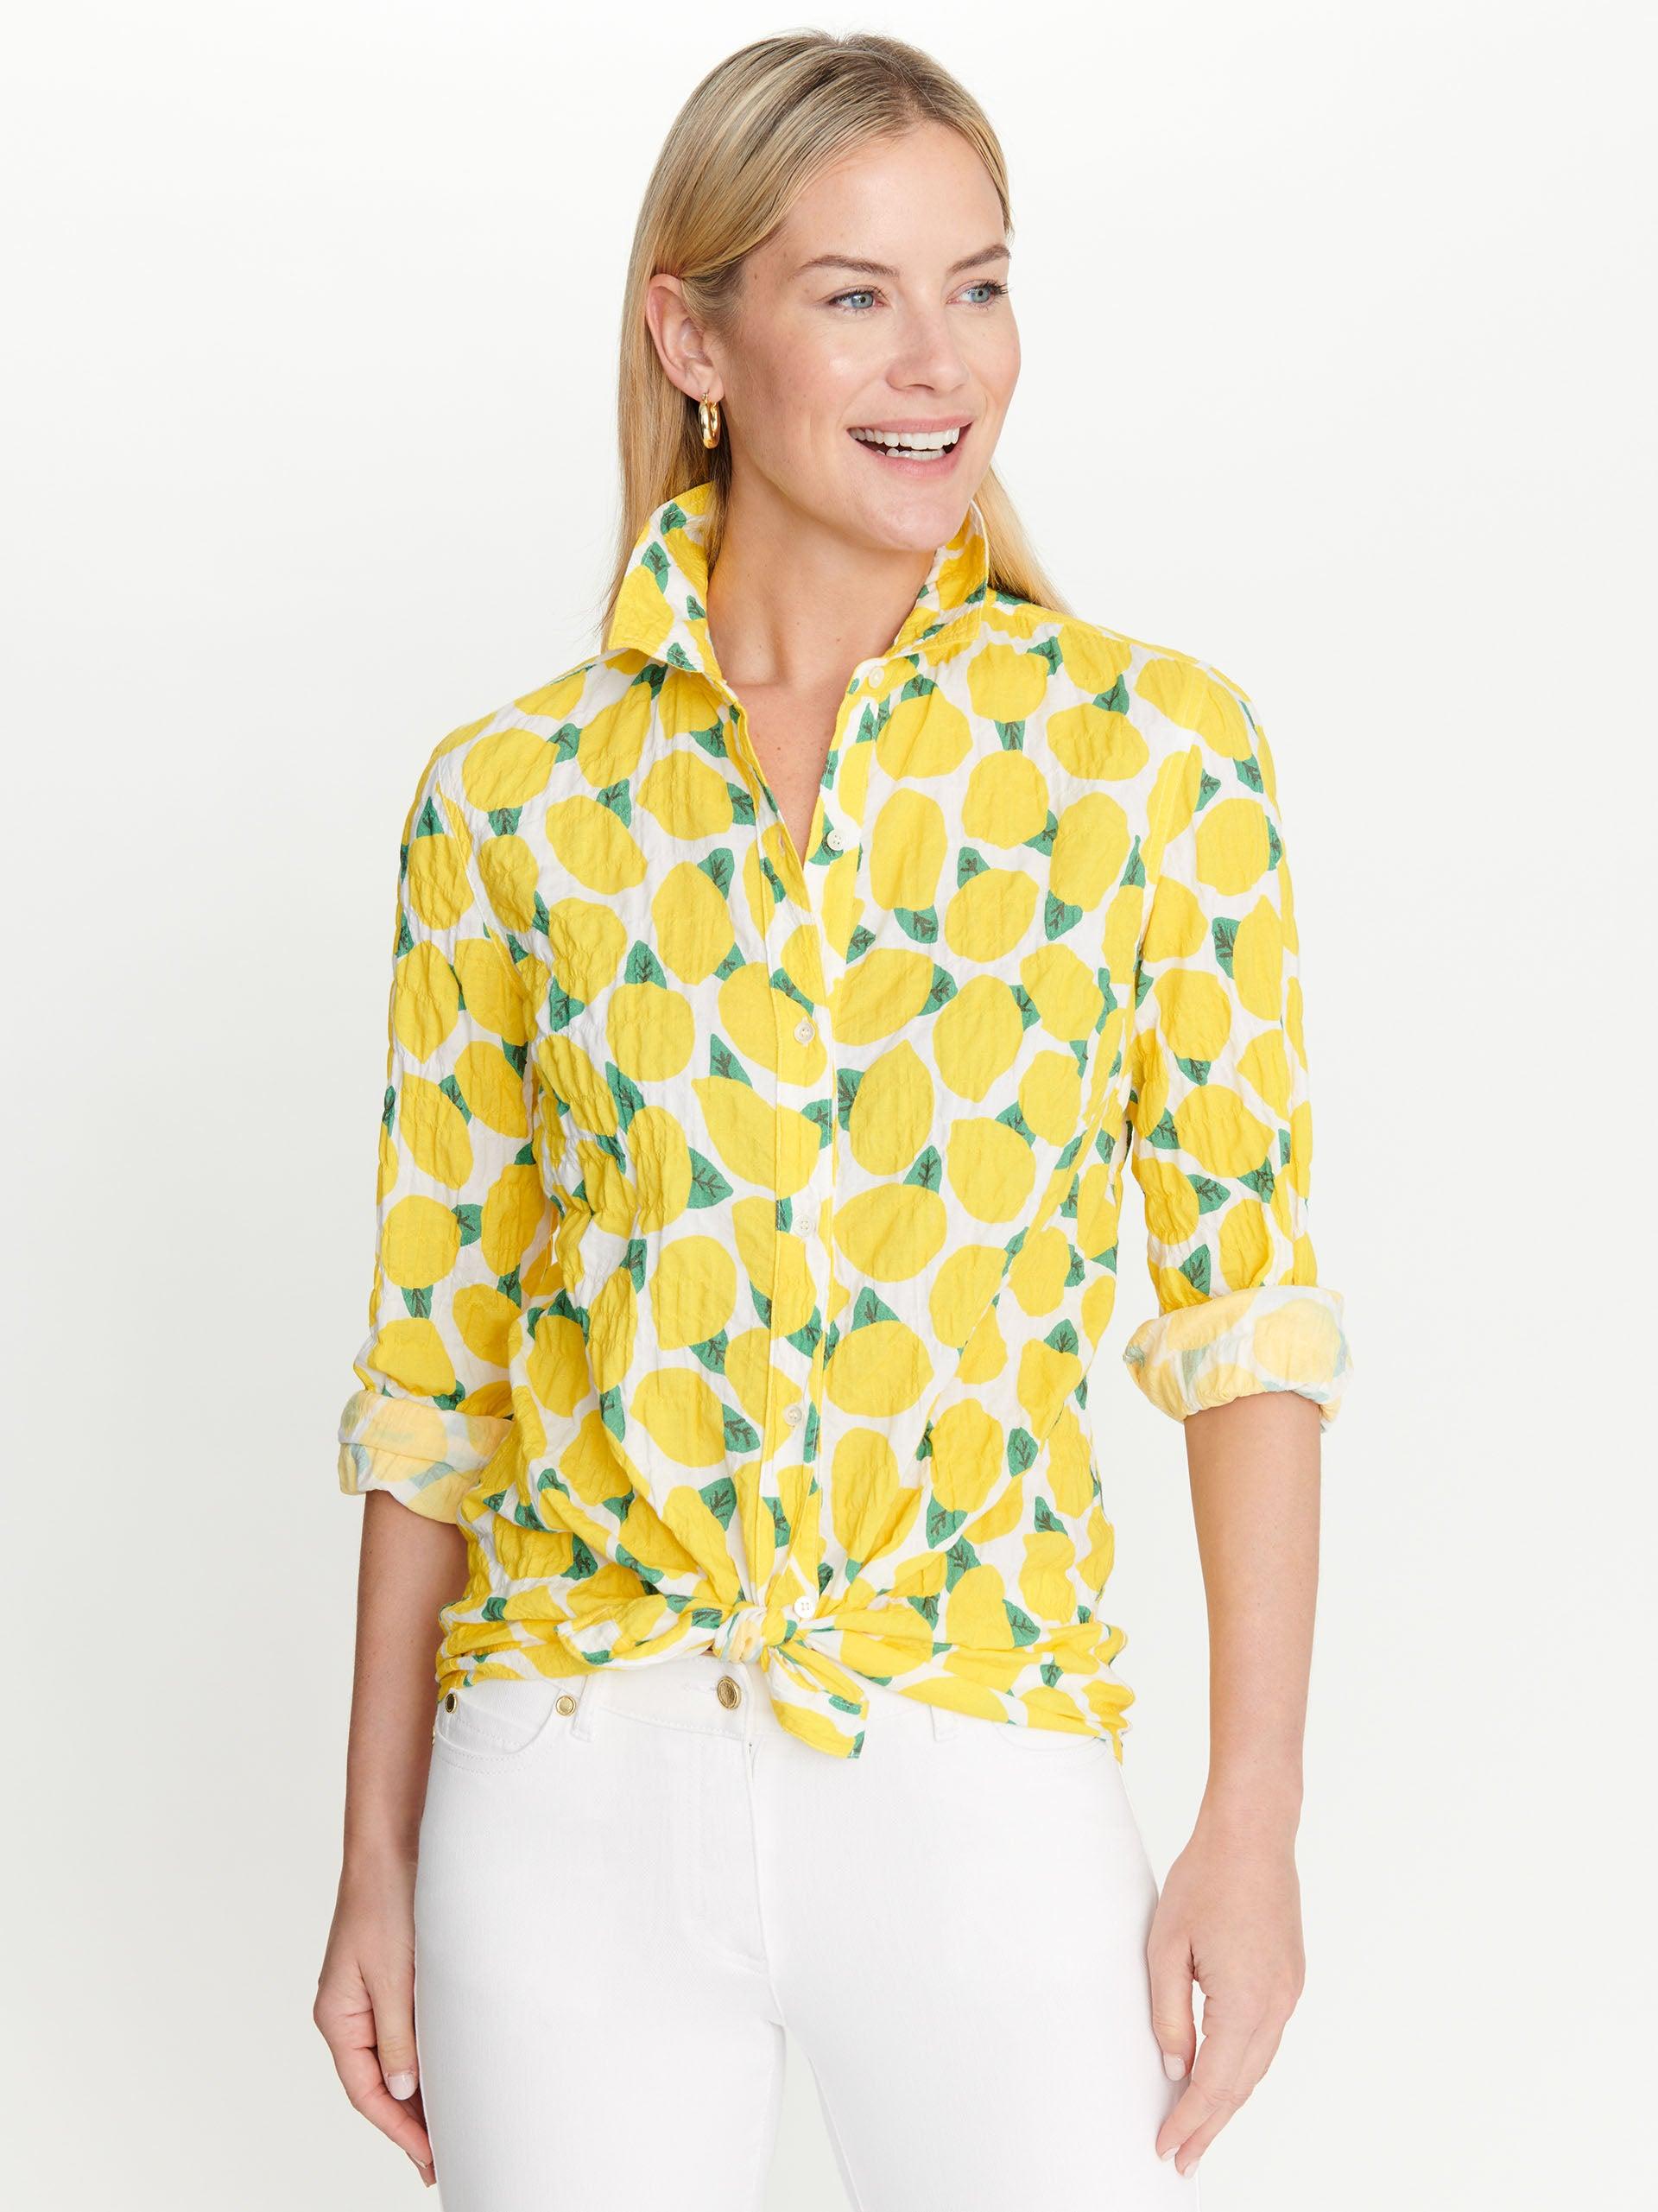 Quatrefoil,Short Sleeve T Shirt Trellis in Yellow,Printed T-Shirt Casual Tops Tee